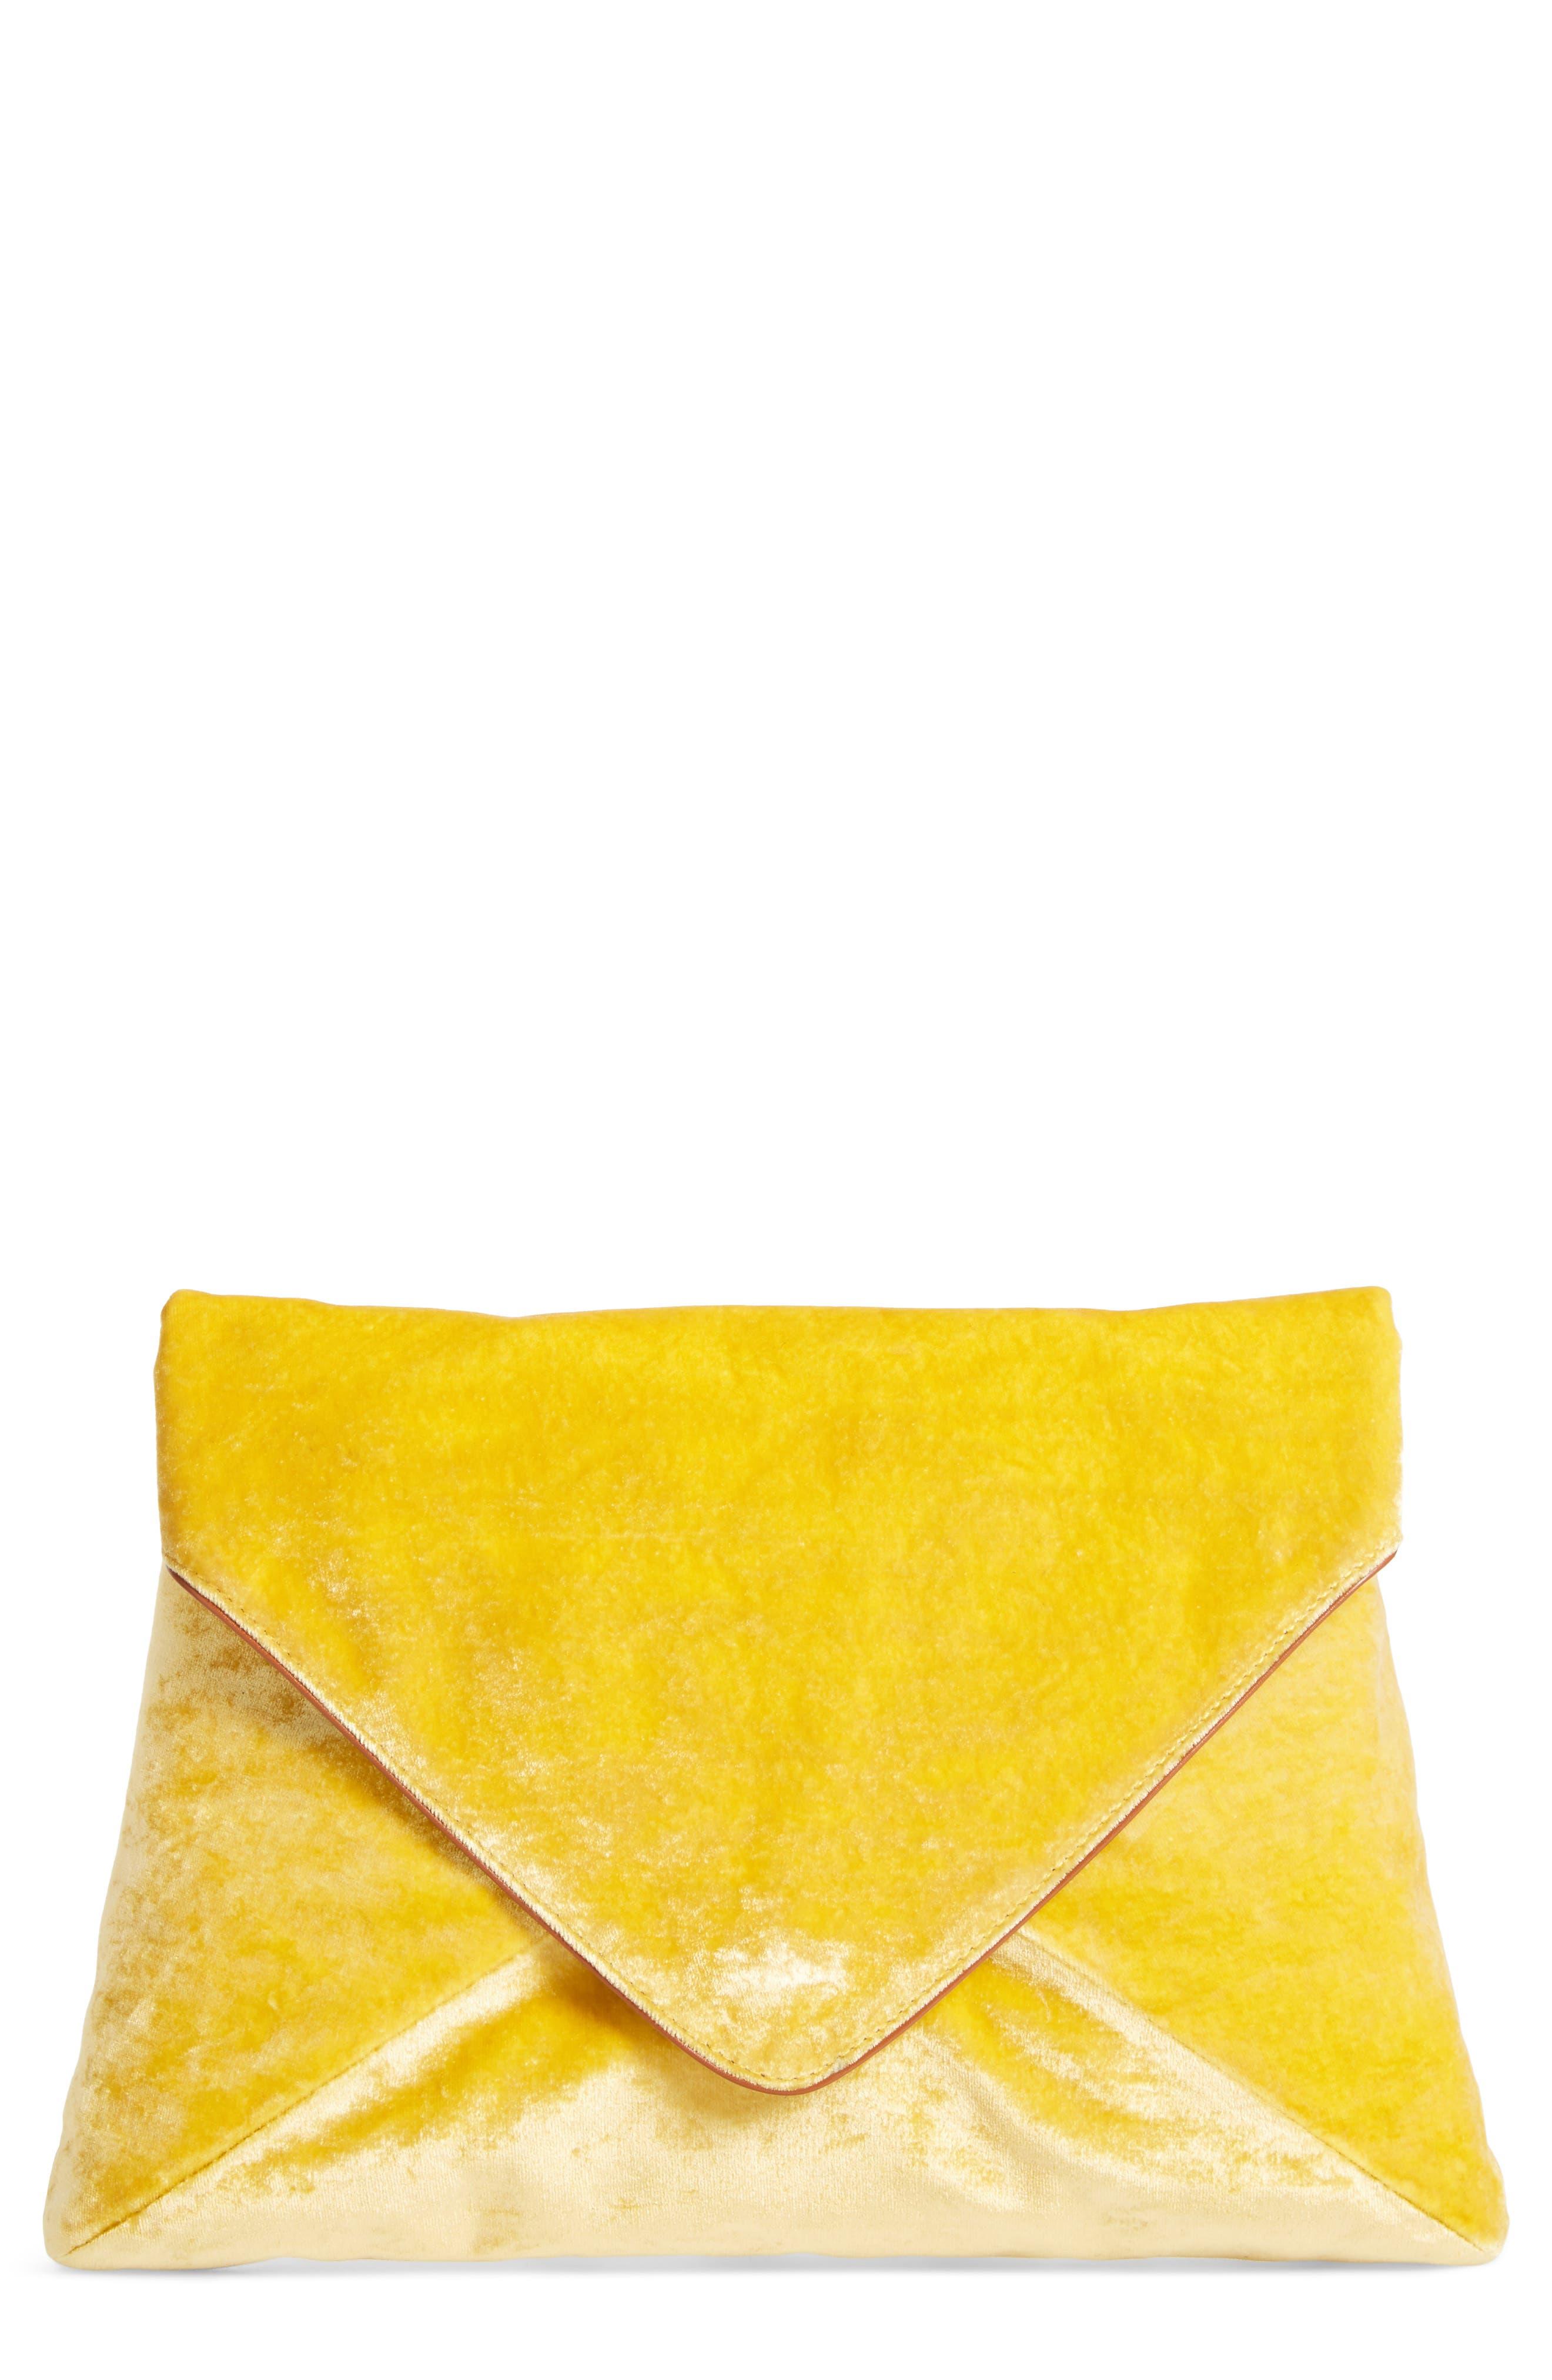 Velvet Envelope Clutch,                             Main thumbnail 1, color,                             Yellow